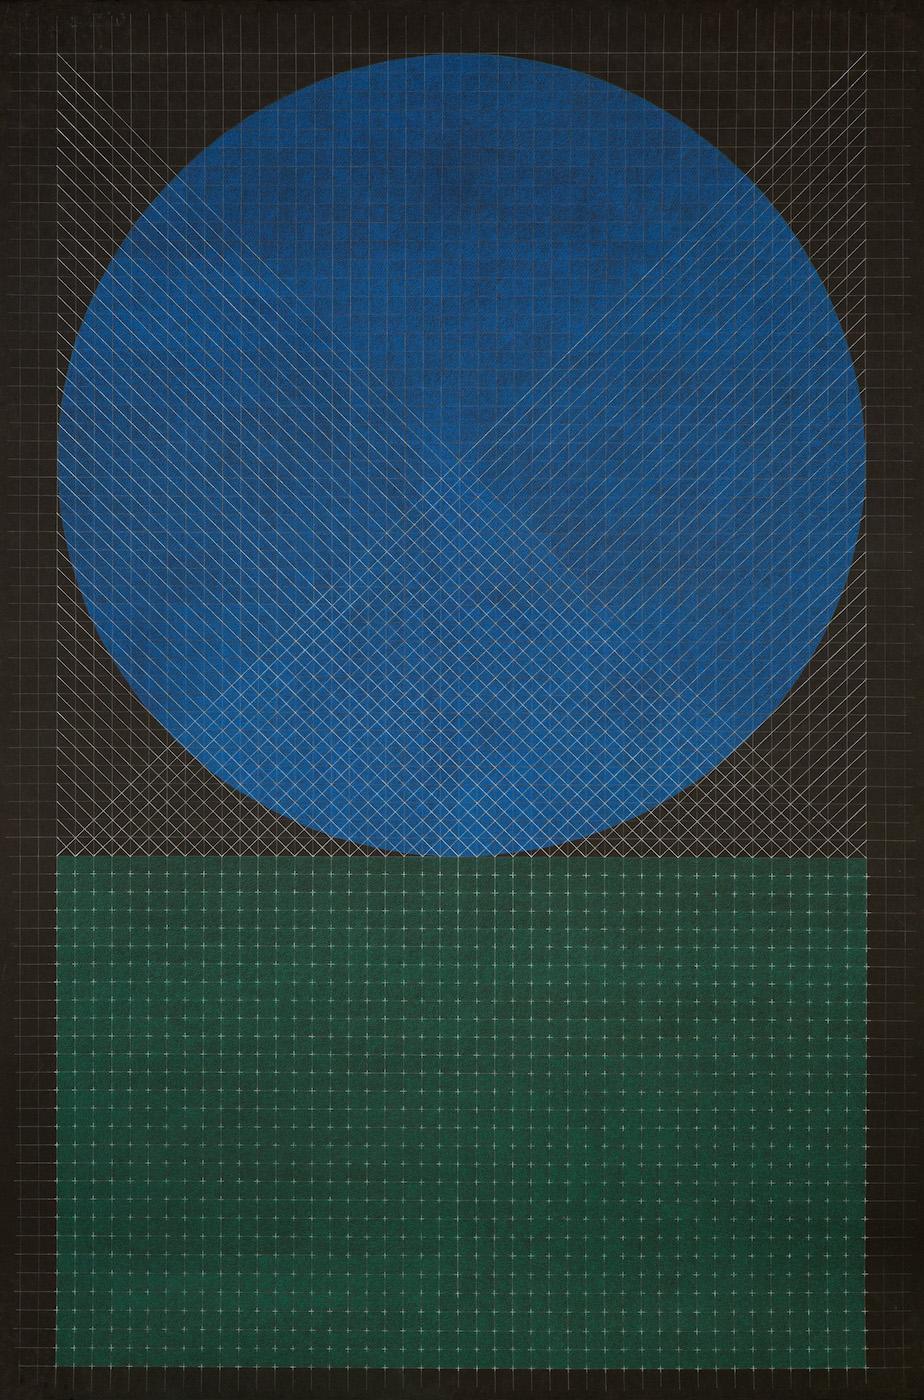 Fahd Burki  Untitled 2015 Pastel pencils on paper 154 cm x 101.5 cm